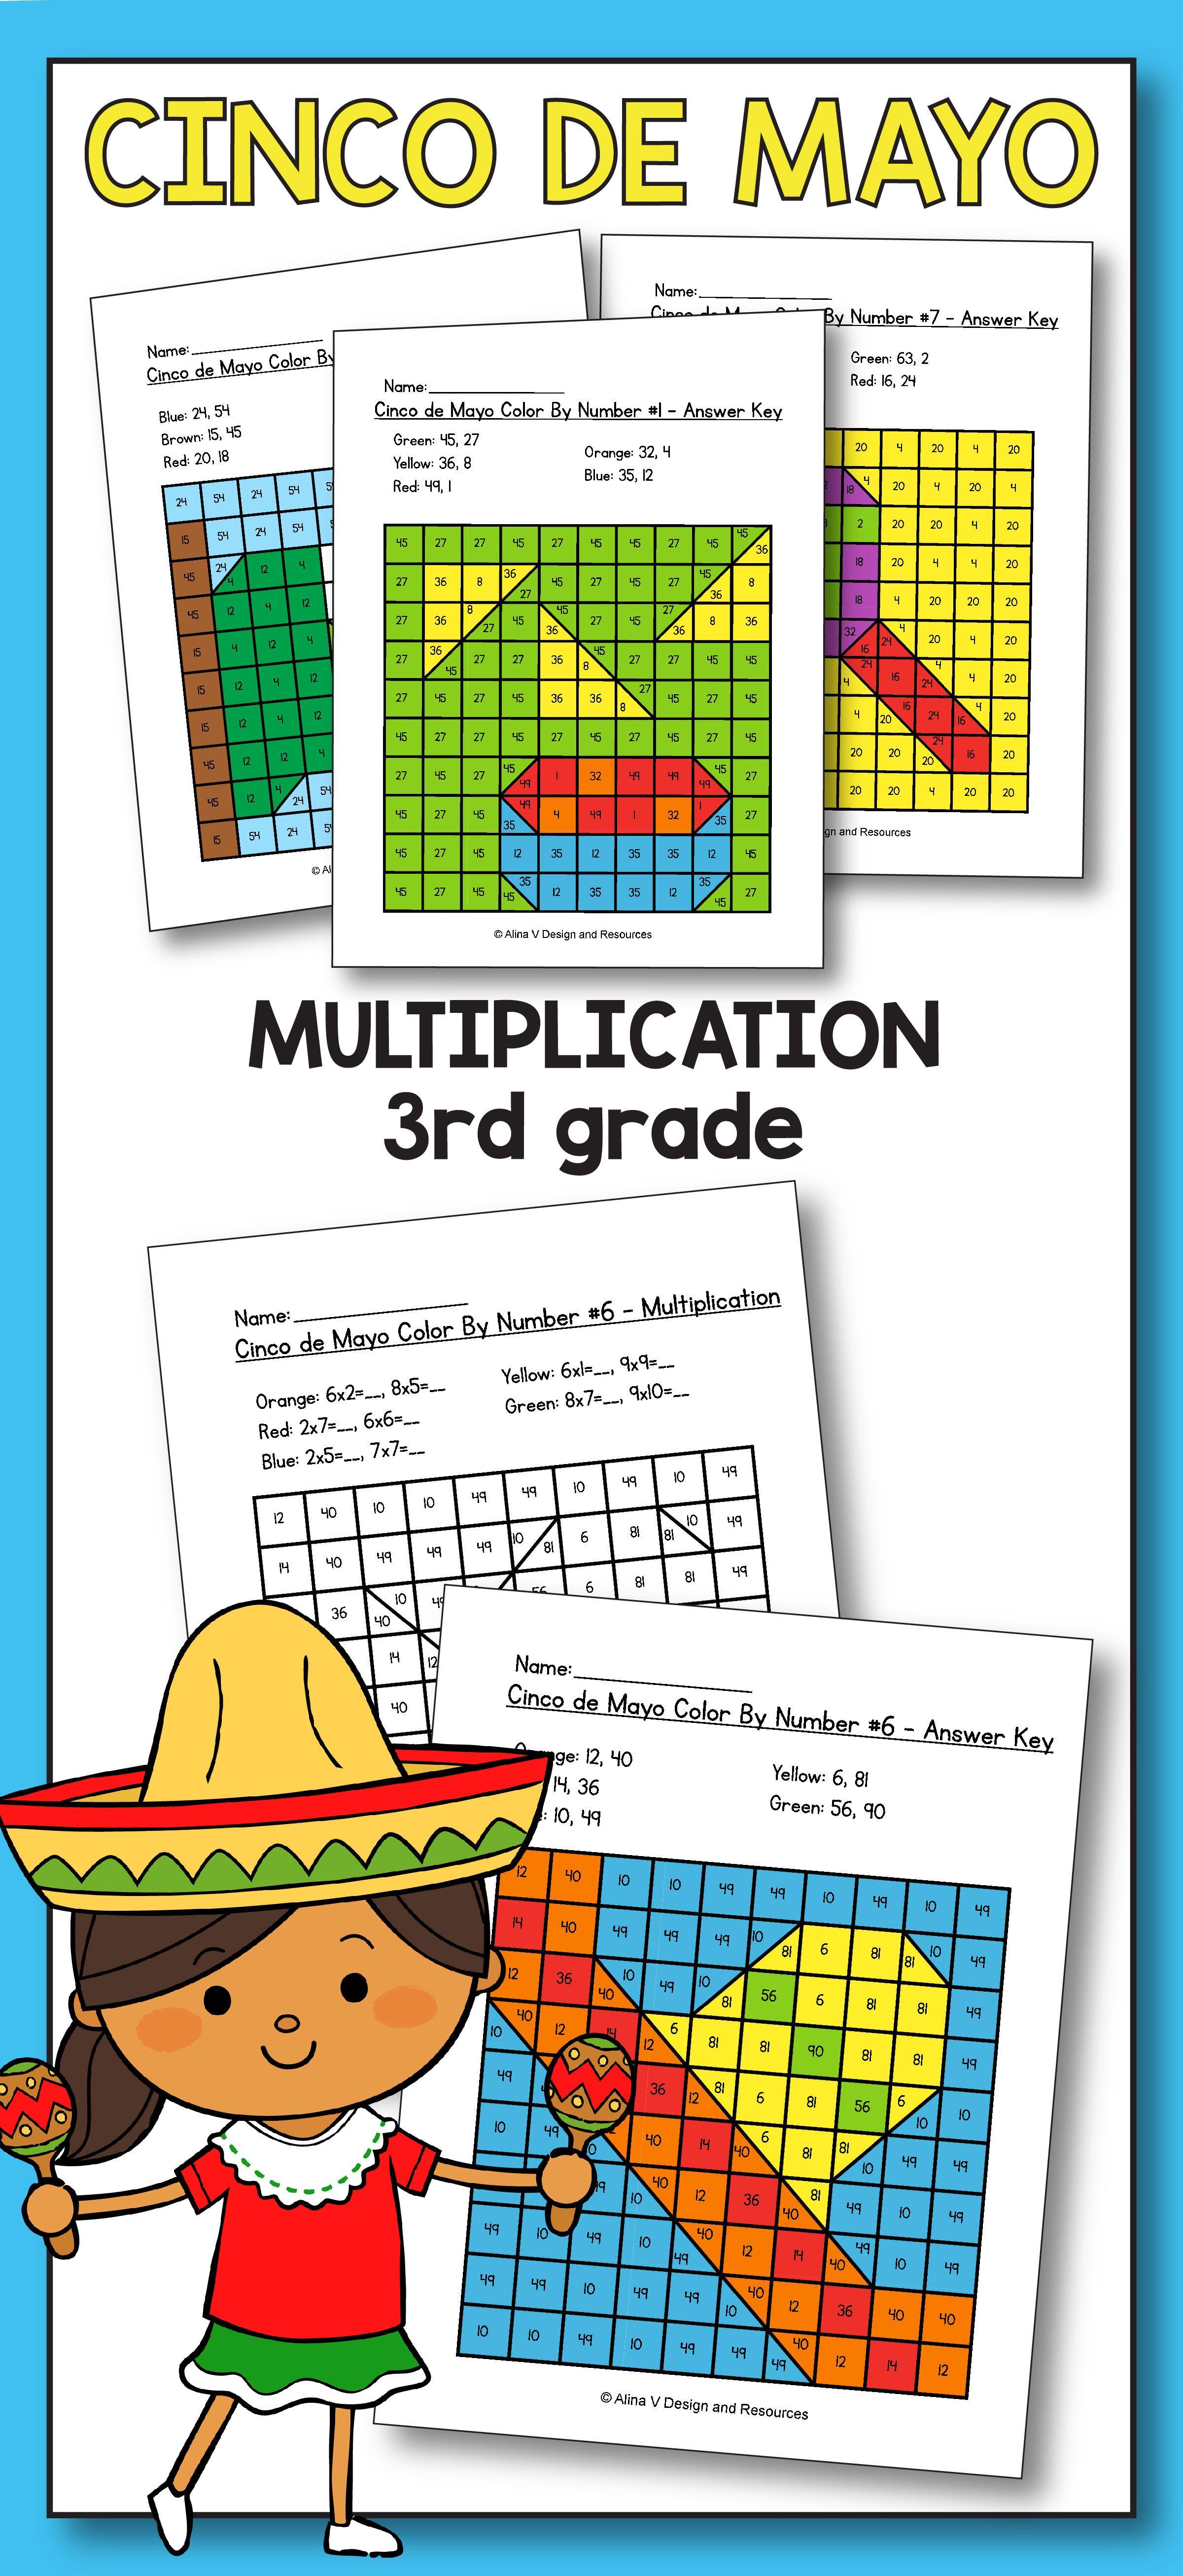 Cinco De Mayo Activities For 3rd Grade